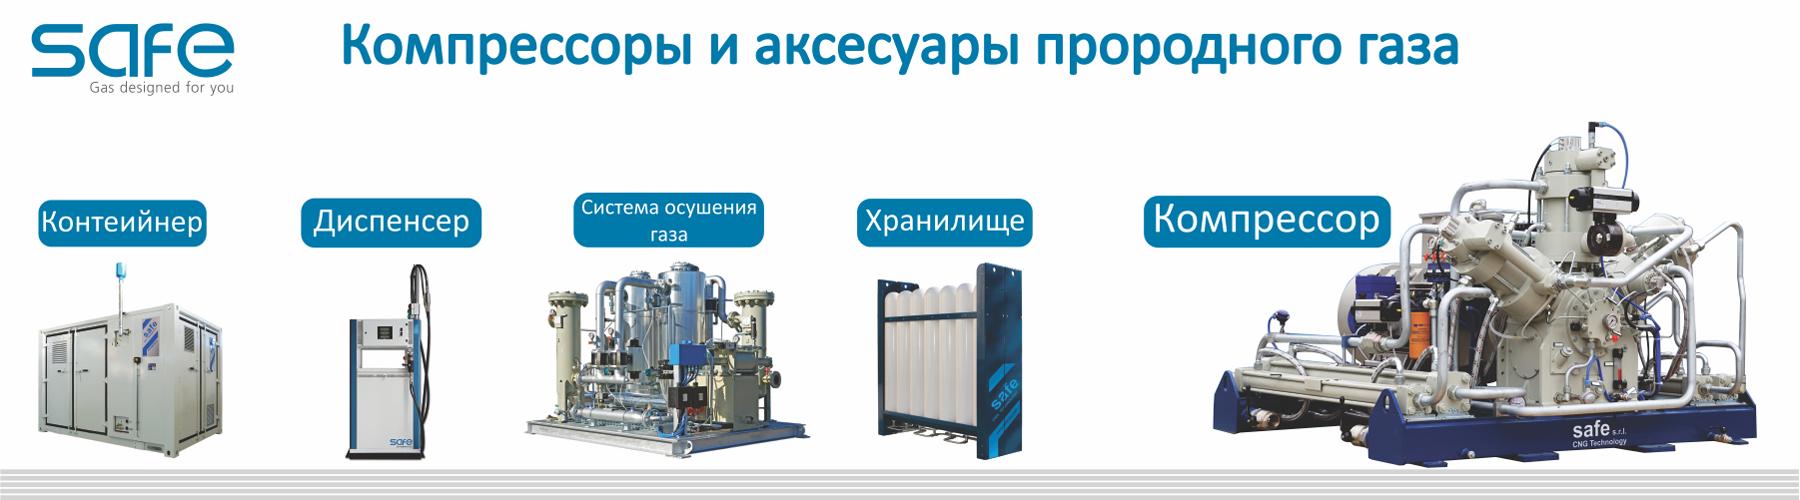 Safe_rus